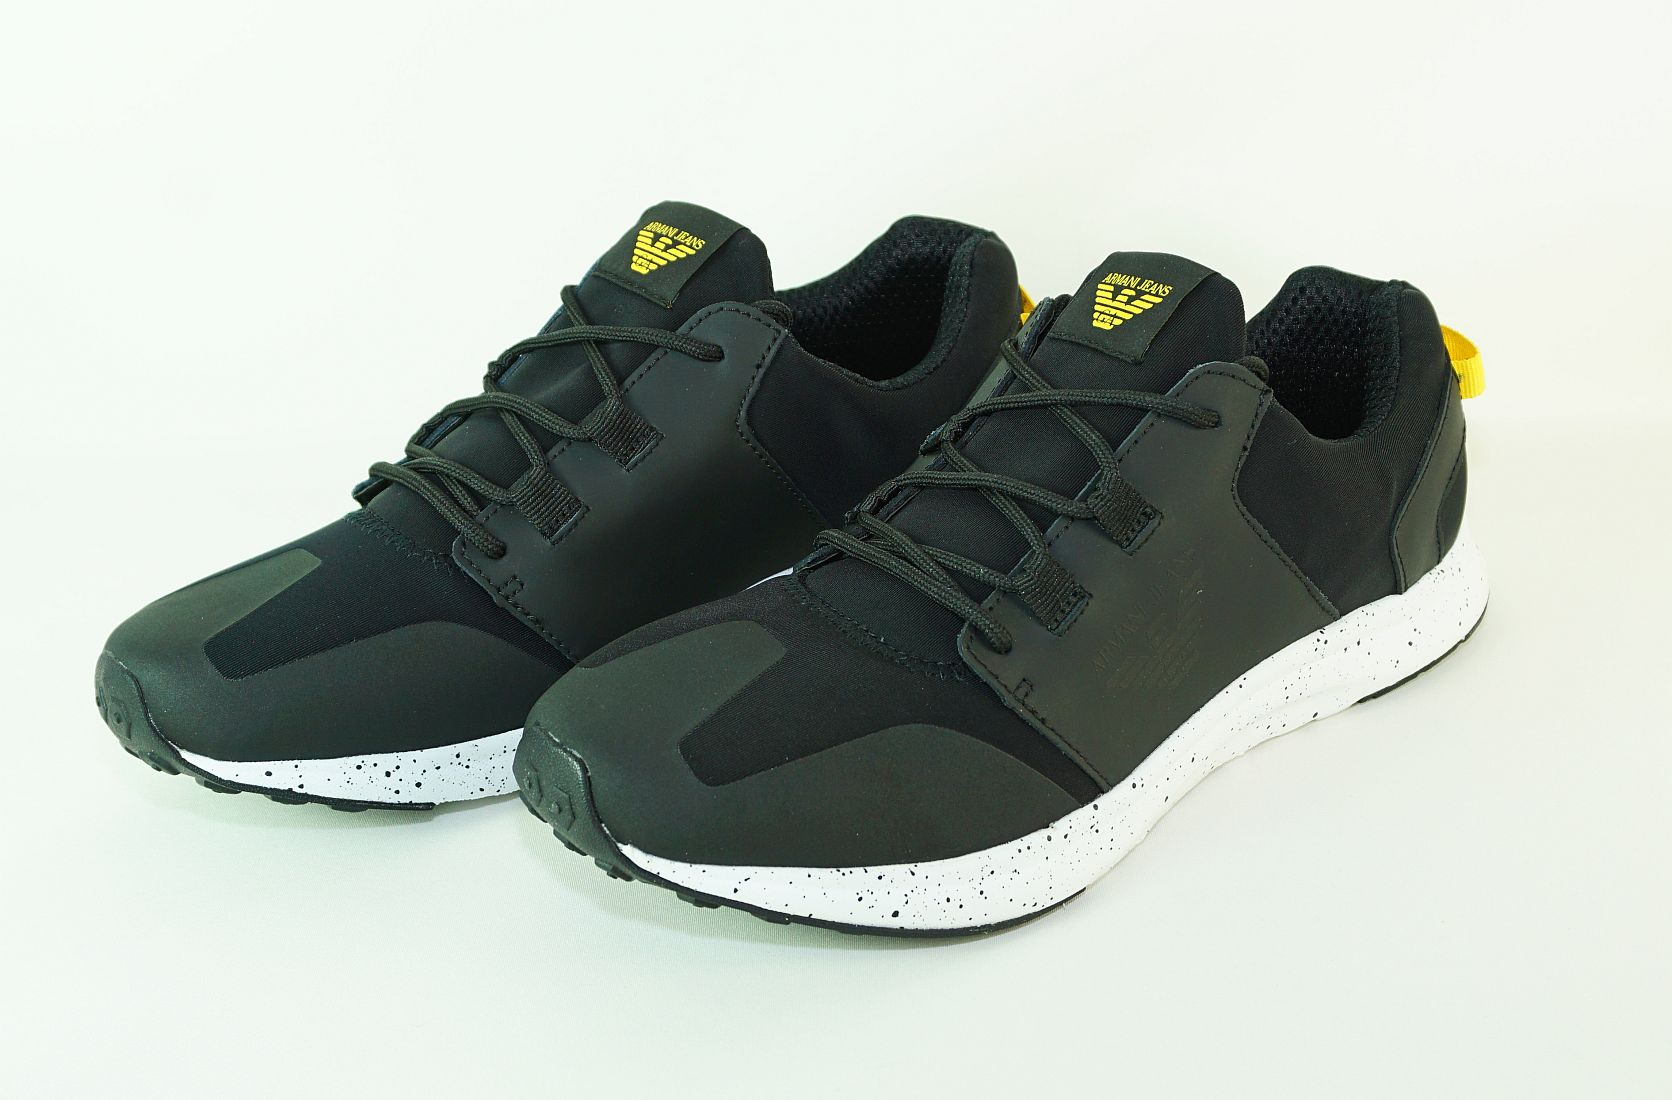 Armani Jeans Schnürschuhe Sneaker Low Cut 935037 7P416 00020 Nero schwarz S17-AJS1